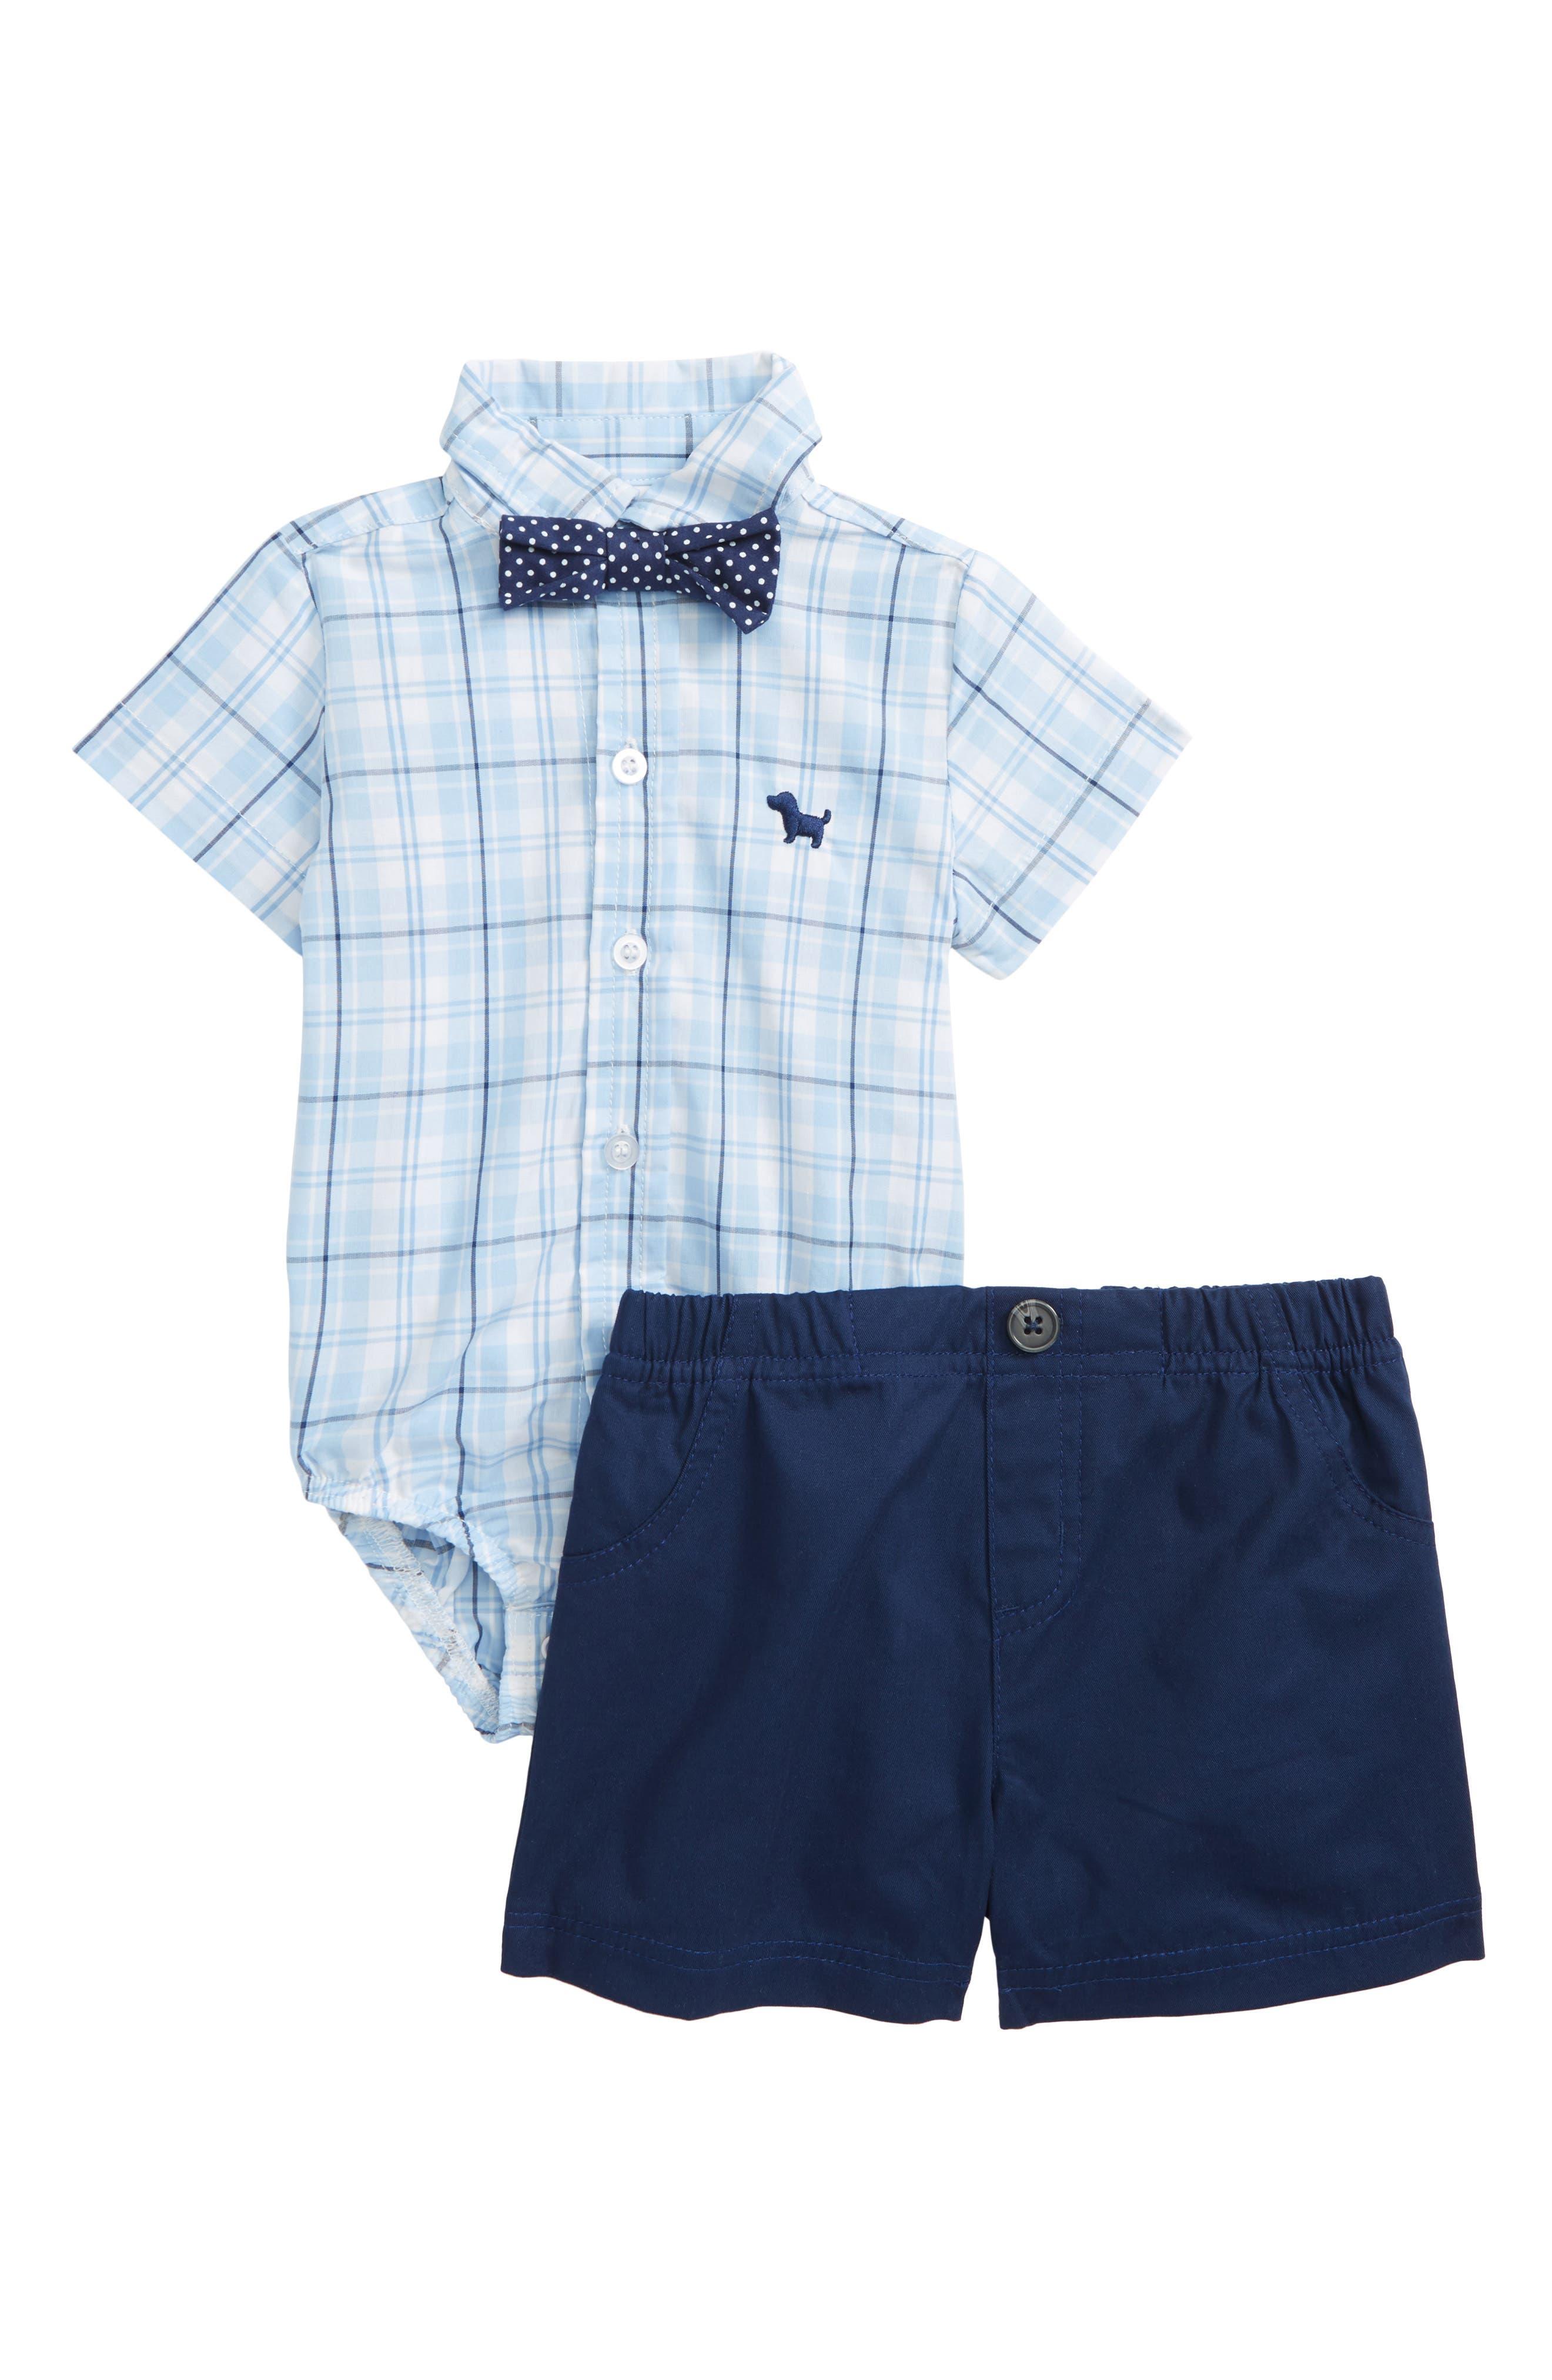 Check Bodysuit, Bow Tie & Shorts Set,                         Main,                         color, Navy